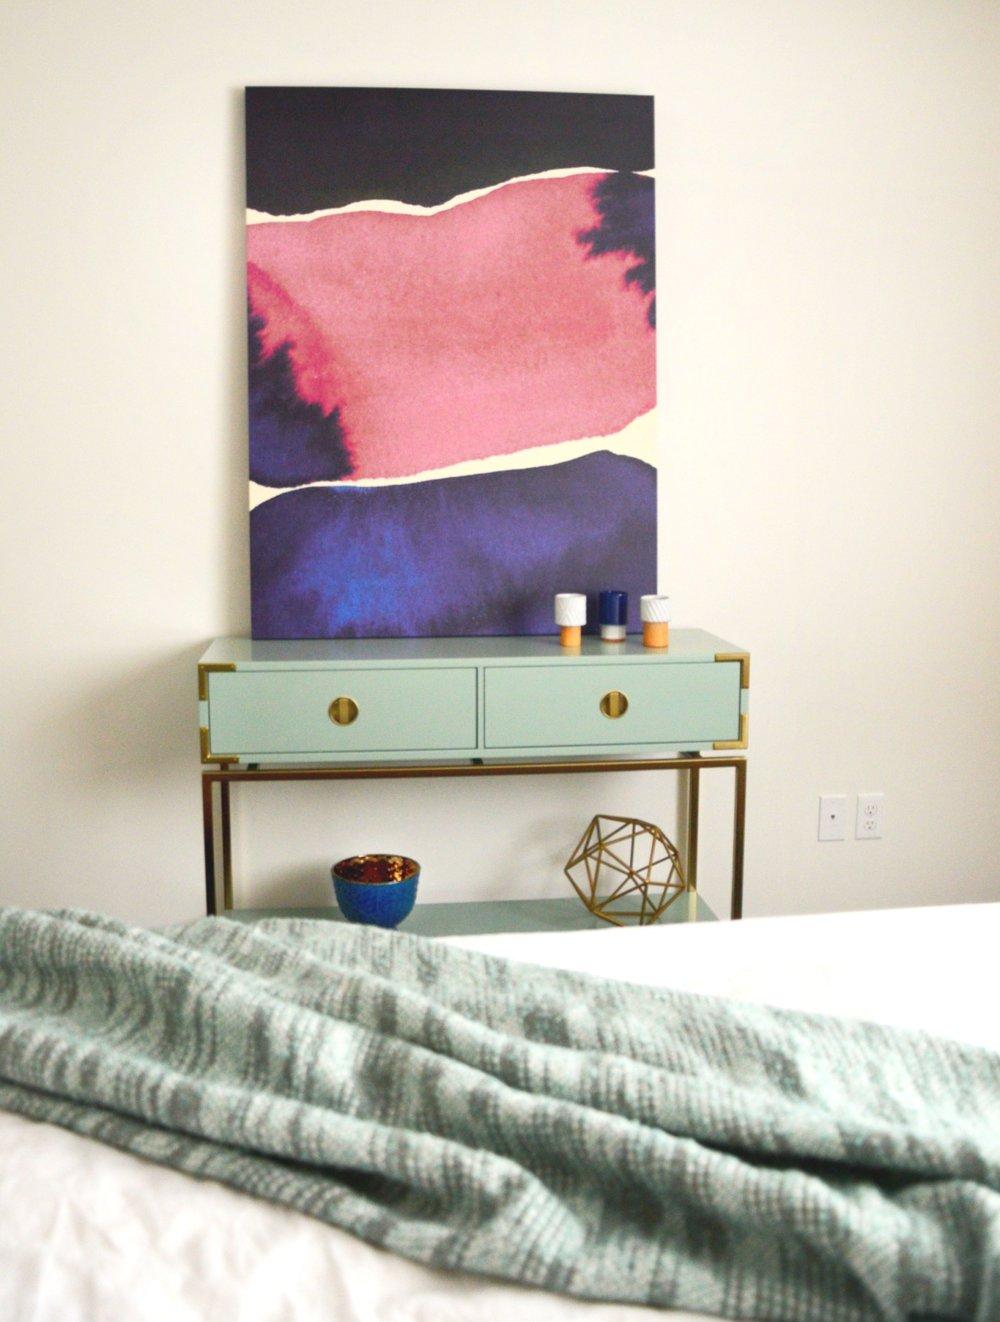 calgary-interior-designer-bedroom-decor-13.jpg